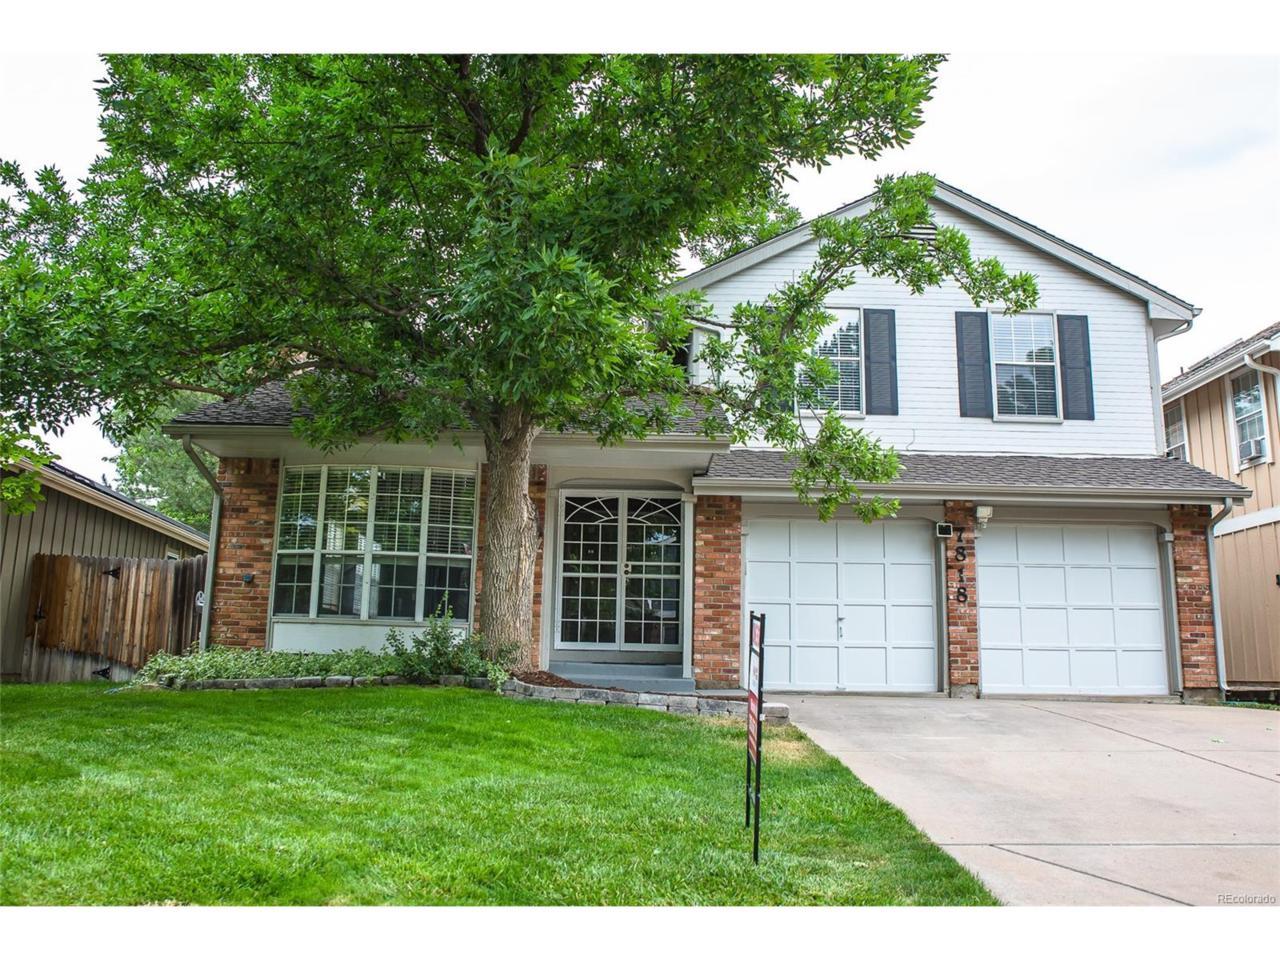 7818 S Hill Circle, Littleton, CO 80120 (MLS #2759108) :: 8z Real Estate